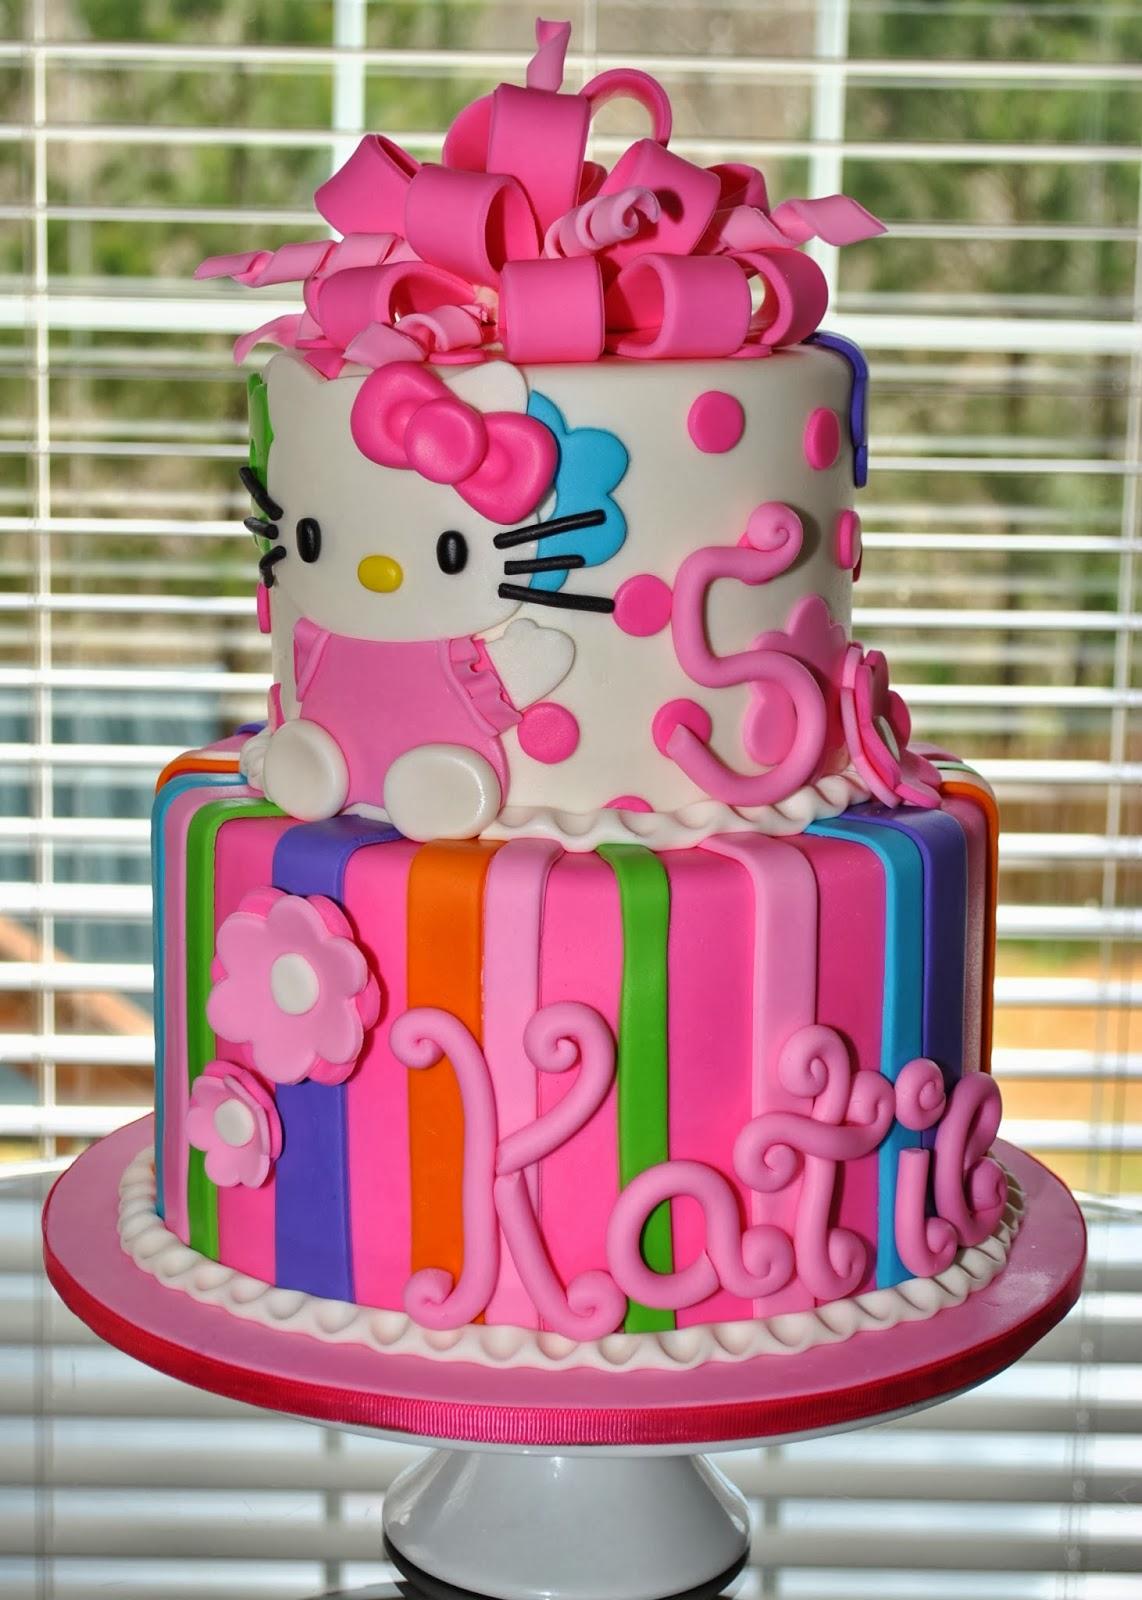 O Kitty Cake